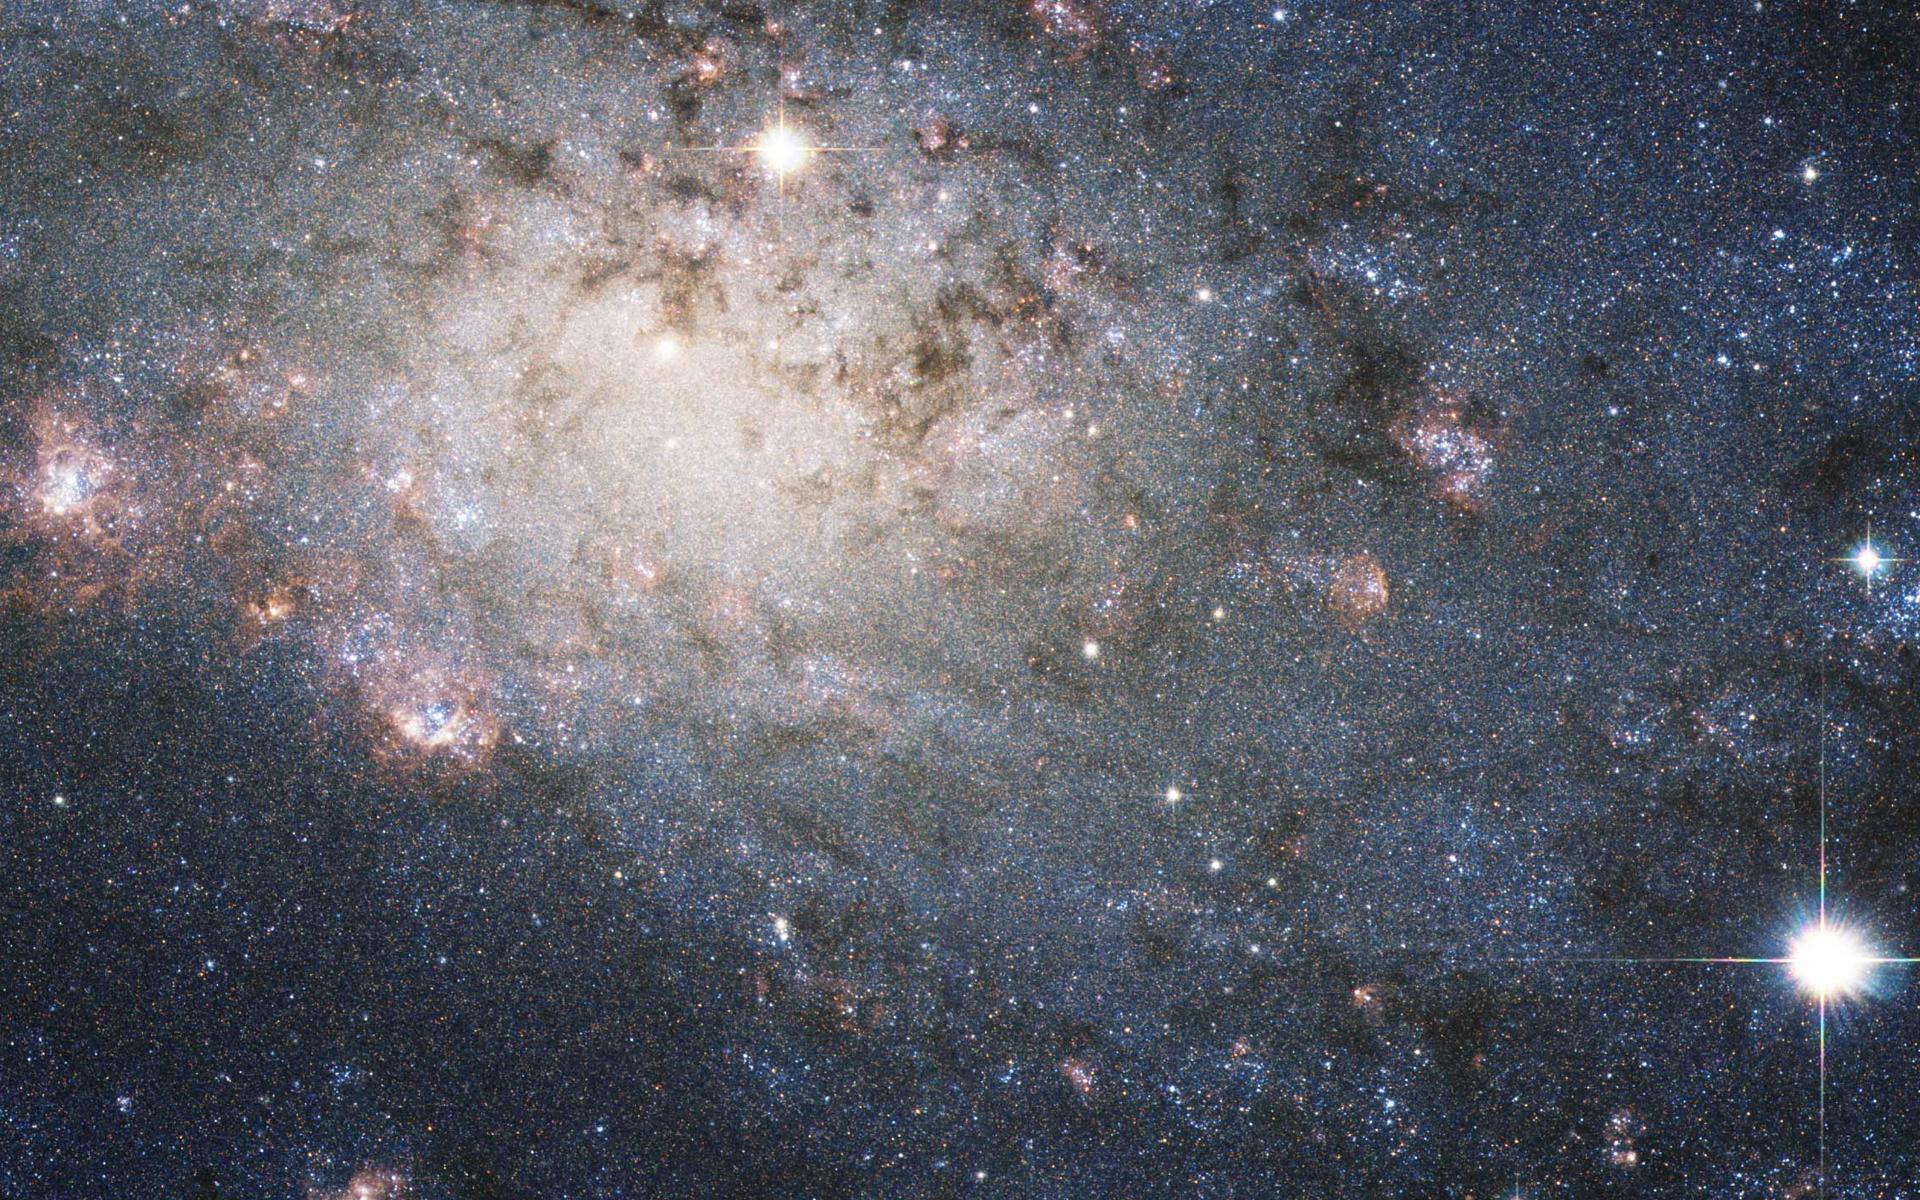 hq galaxy nasa - photo #33